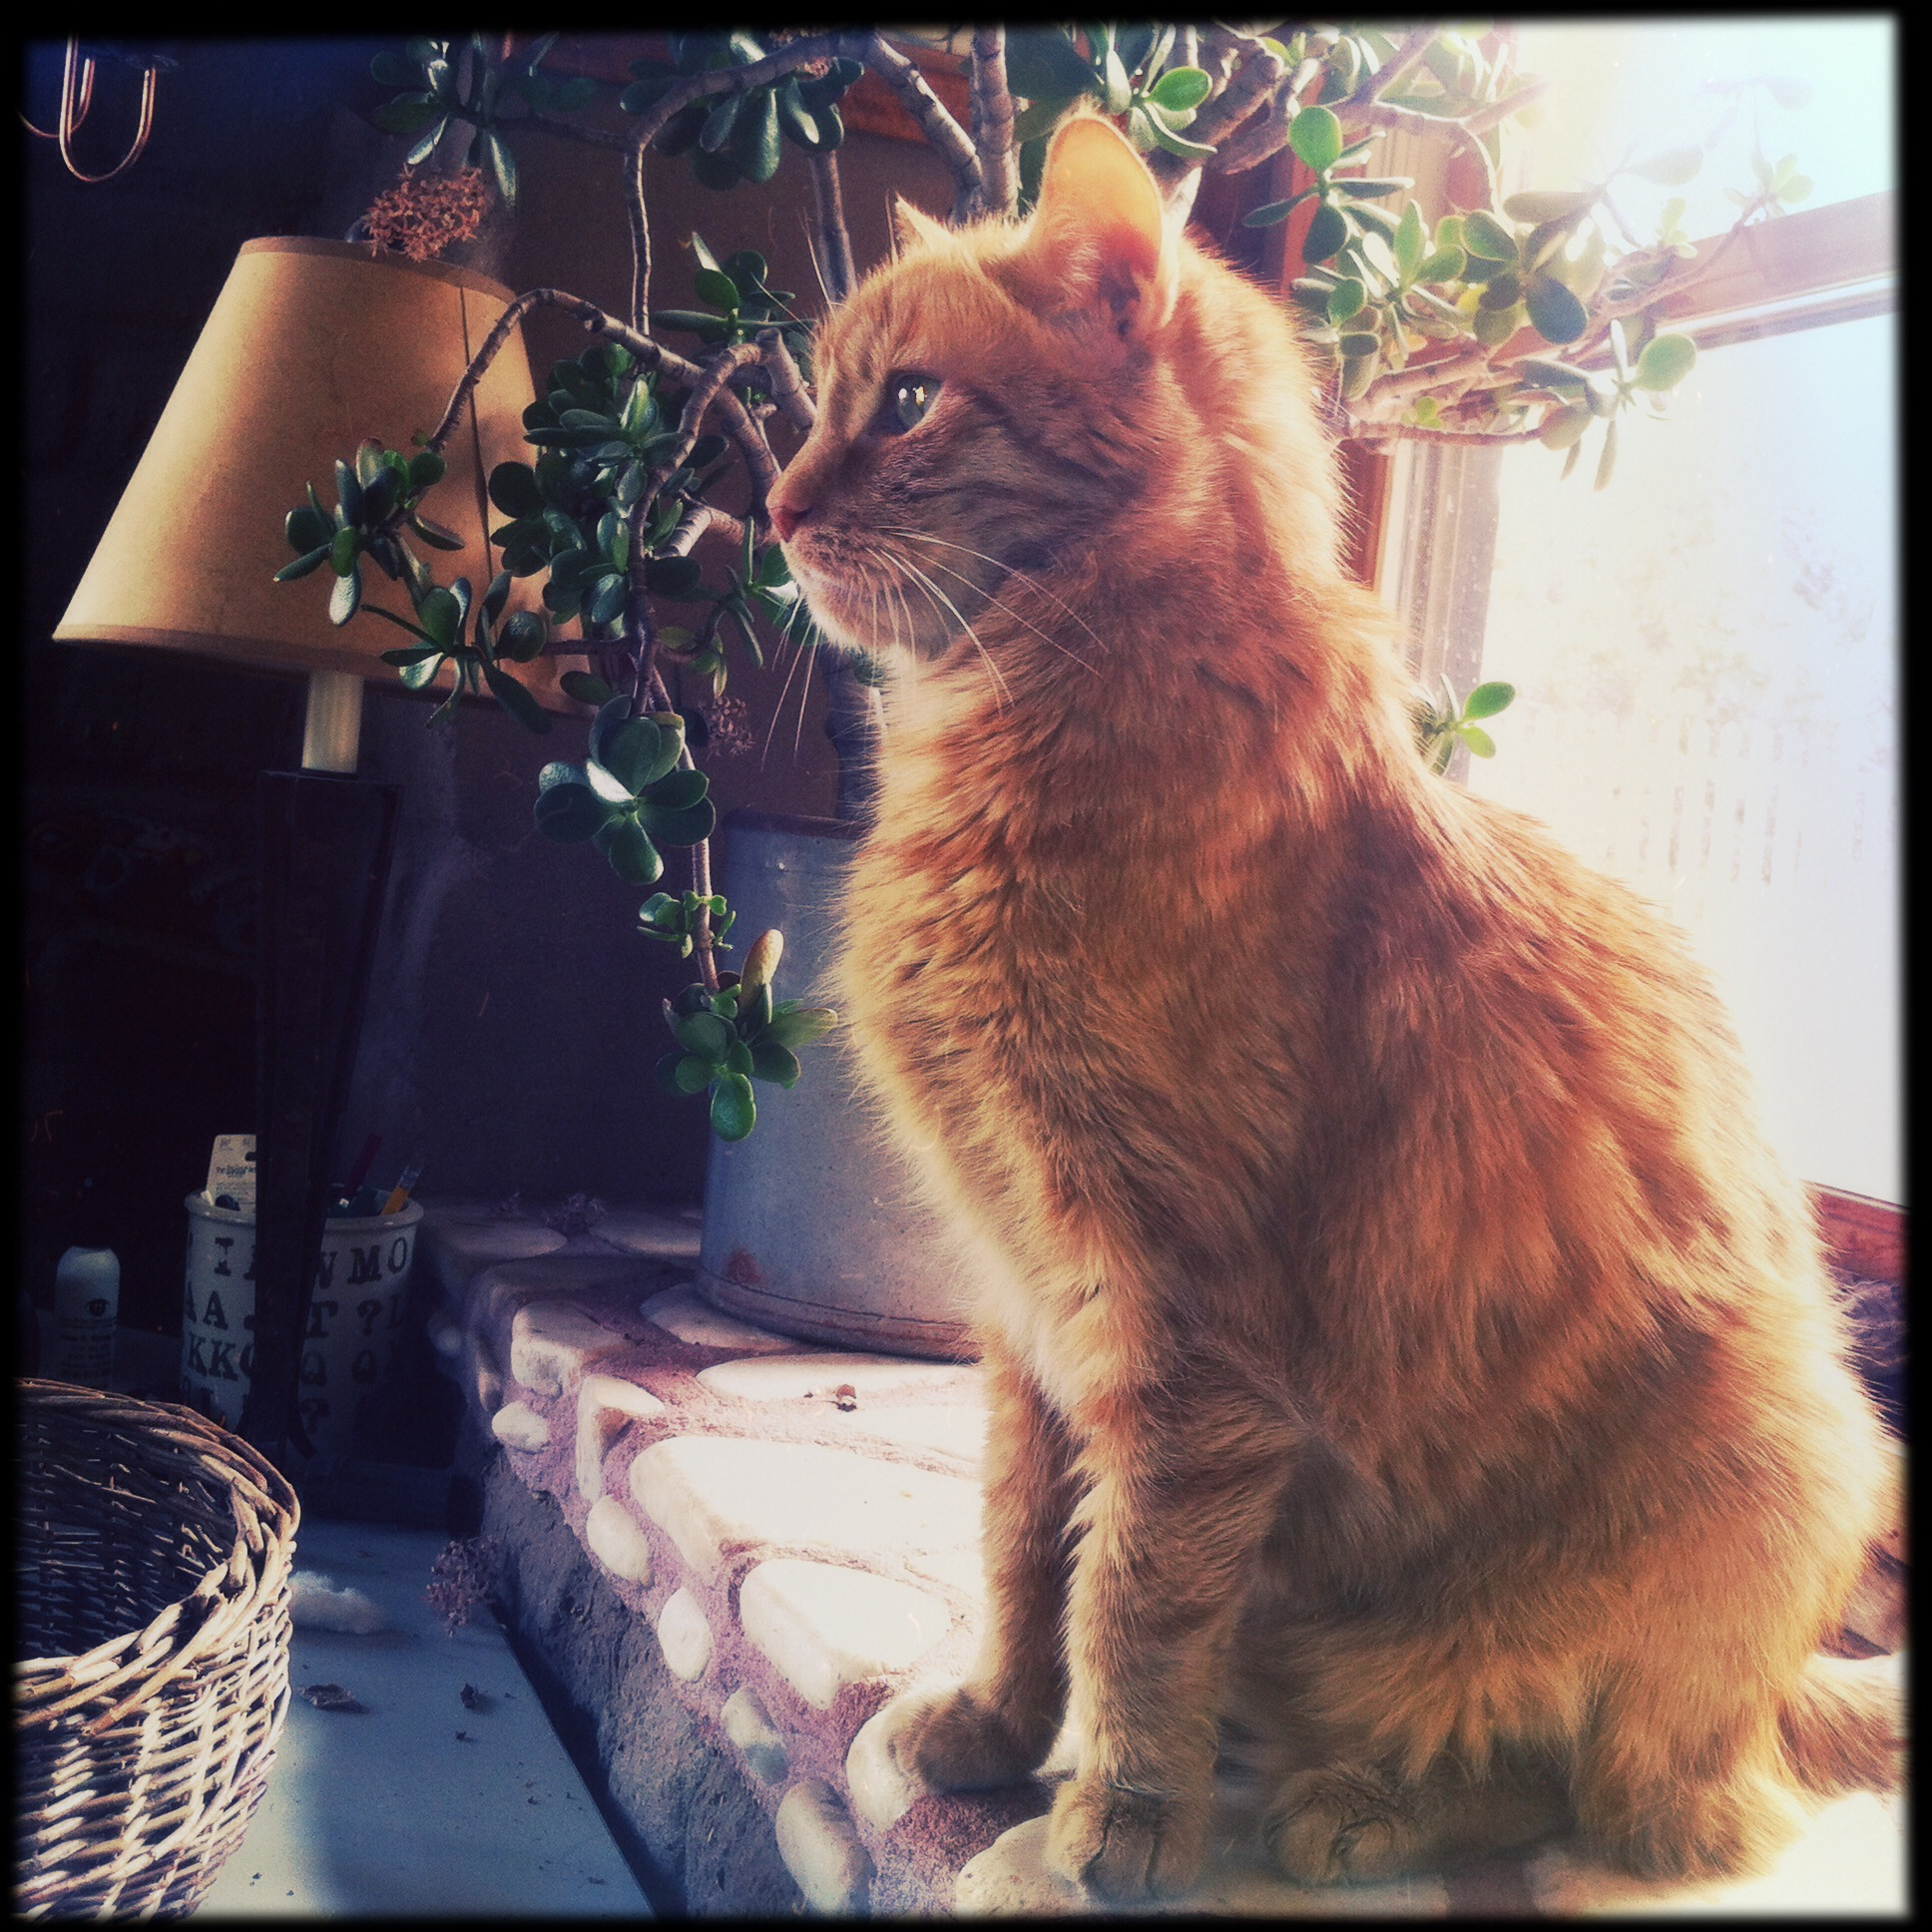 The last cat, Brat Farrar, struggles through a health crisis, striving, like me, for balance.